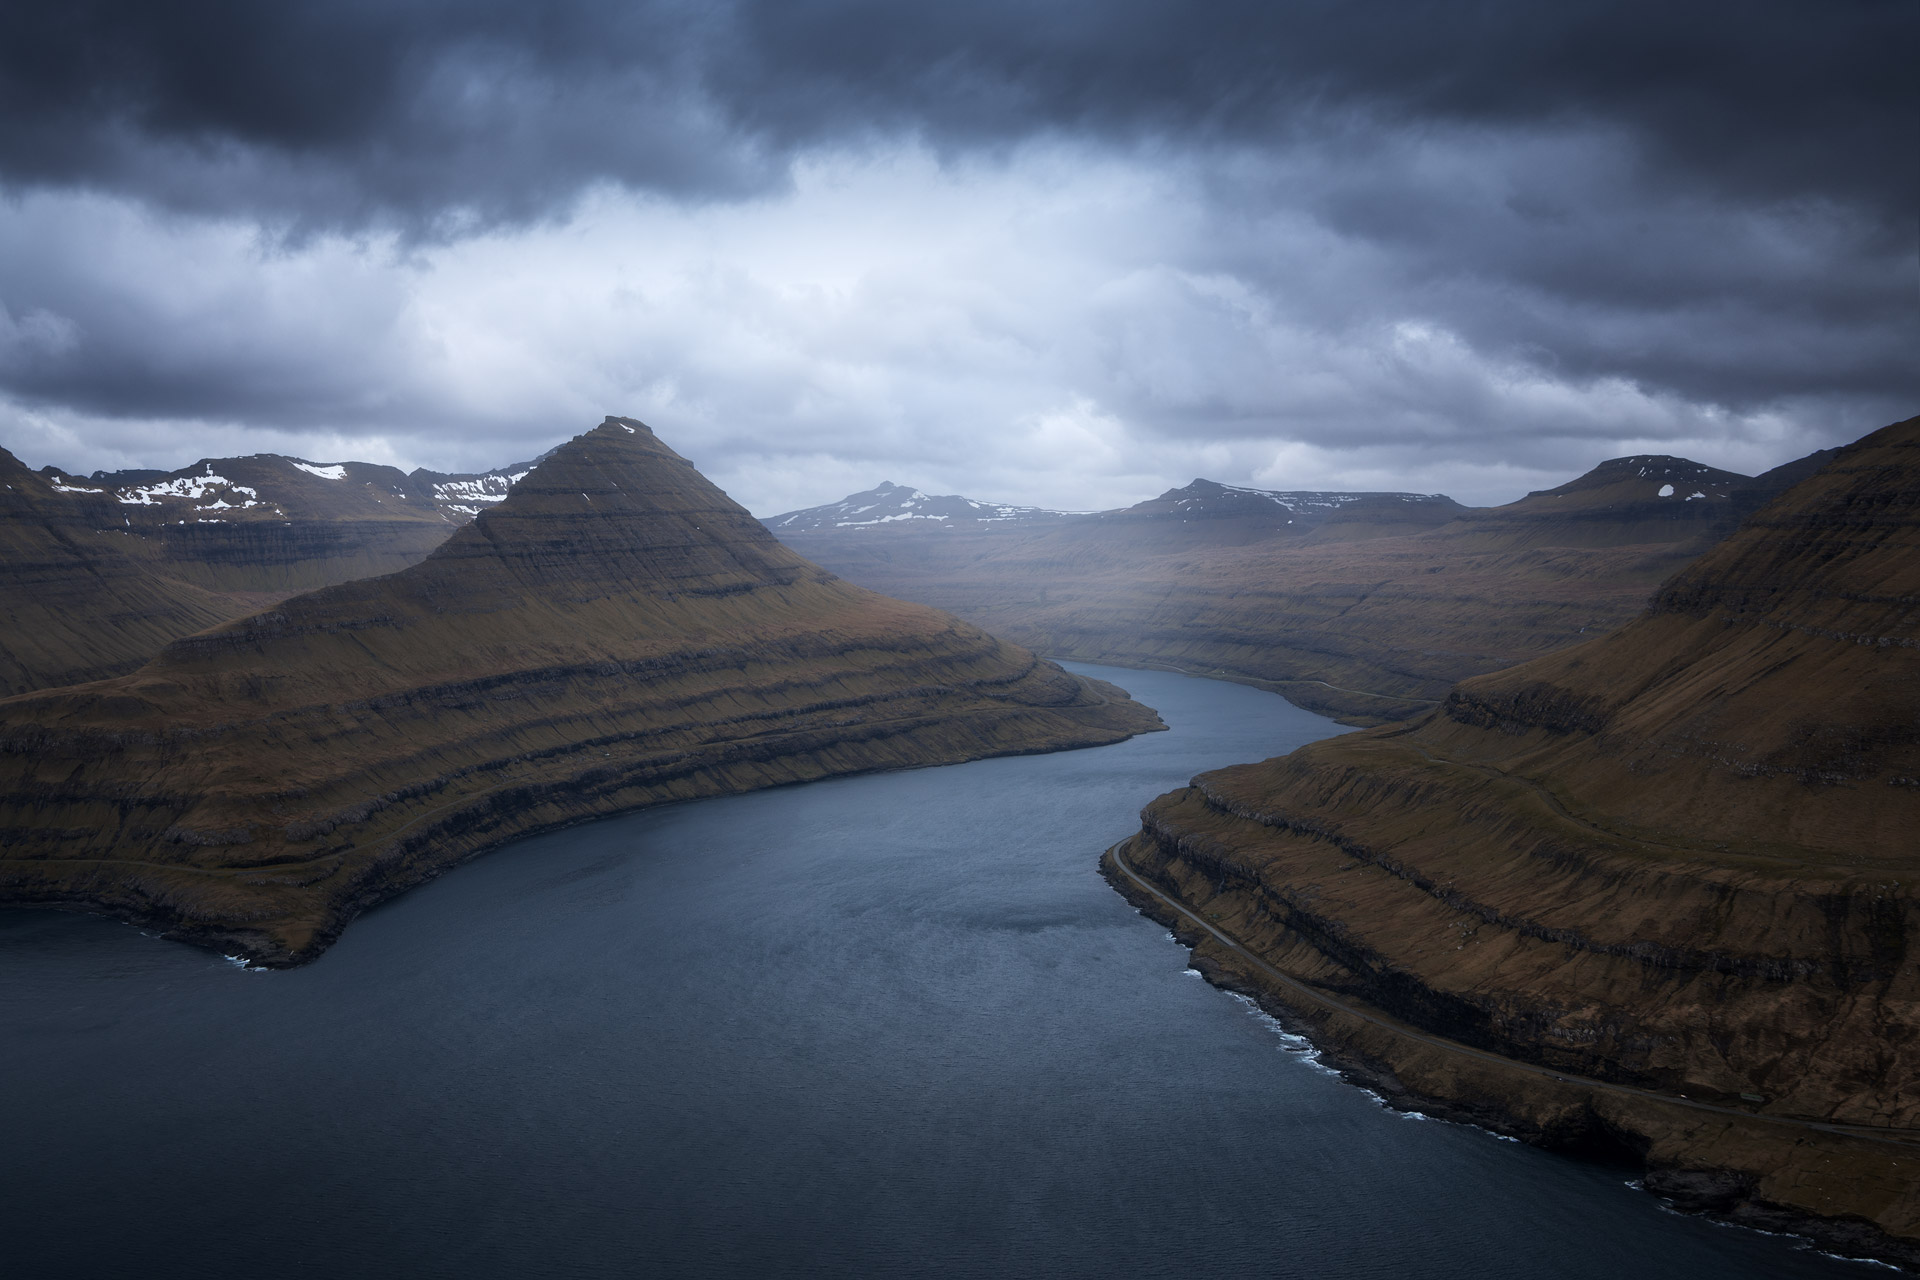 May - Faroe Islands & The Local Area